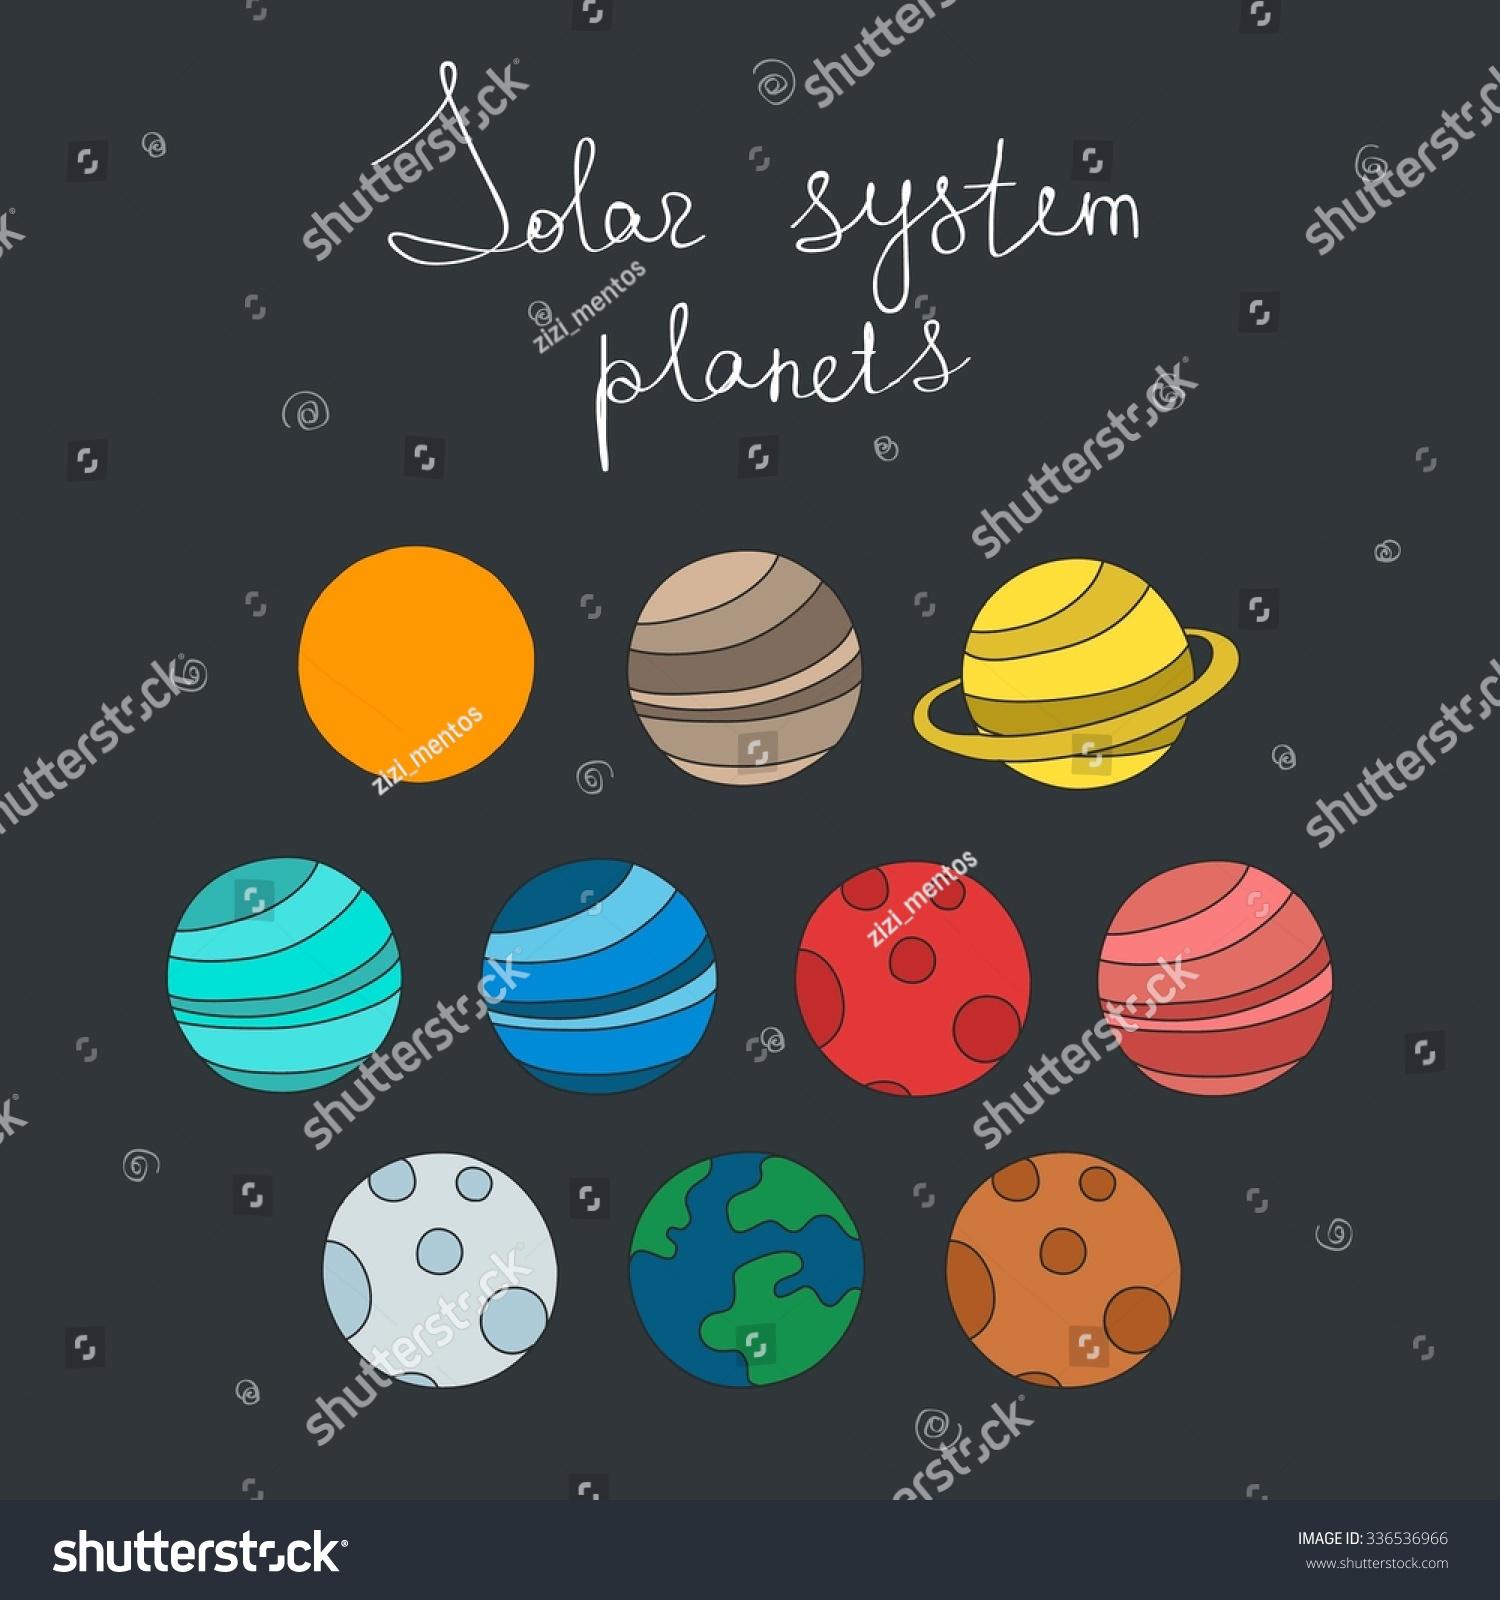 solar system vector - photo #38